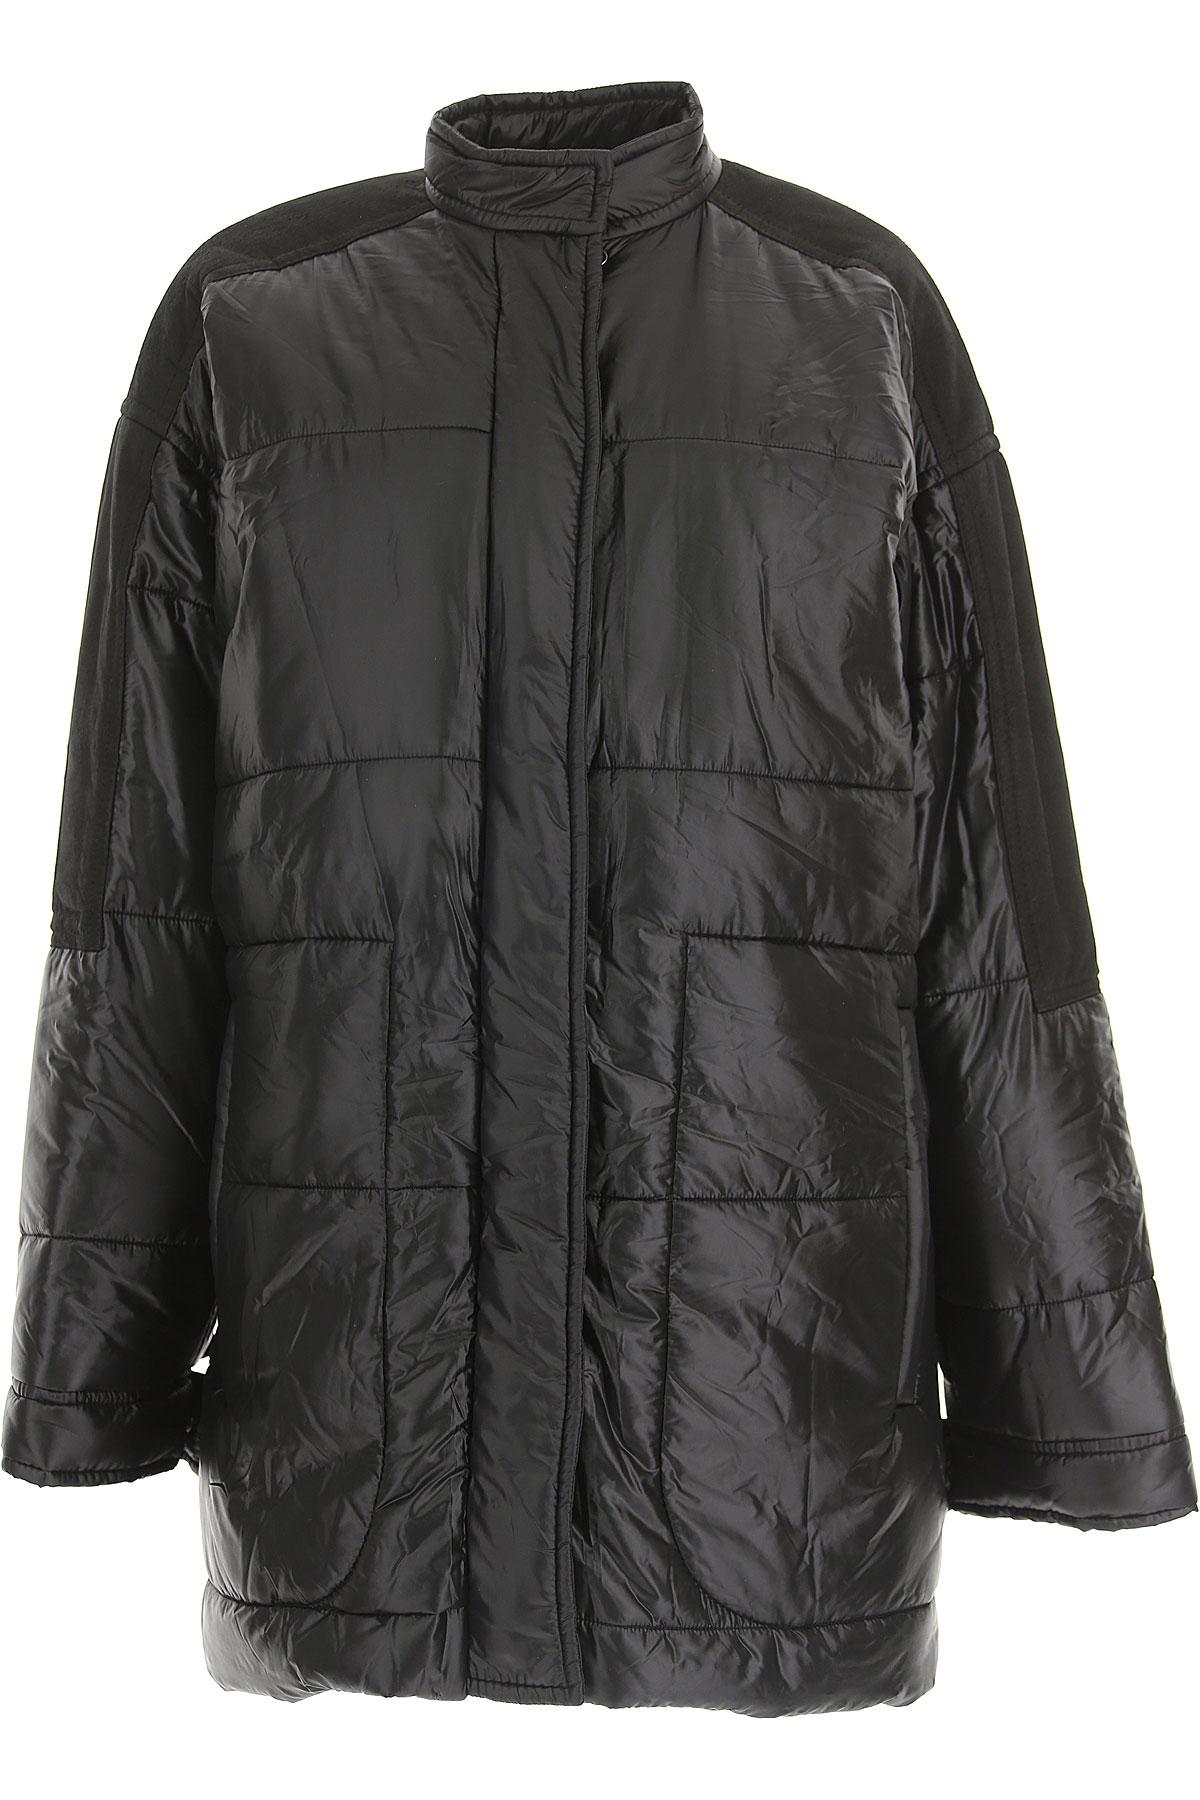 032c Down Jacket for Women, Puffer Ski Jacket On Sale, Black, Nylon, 2017, 10 2 4 6 8